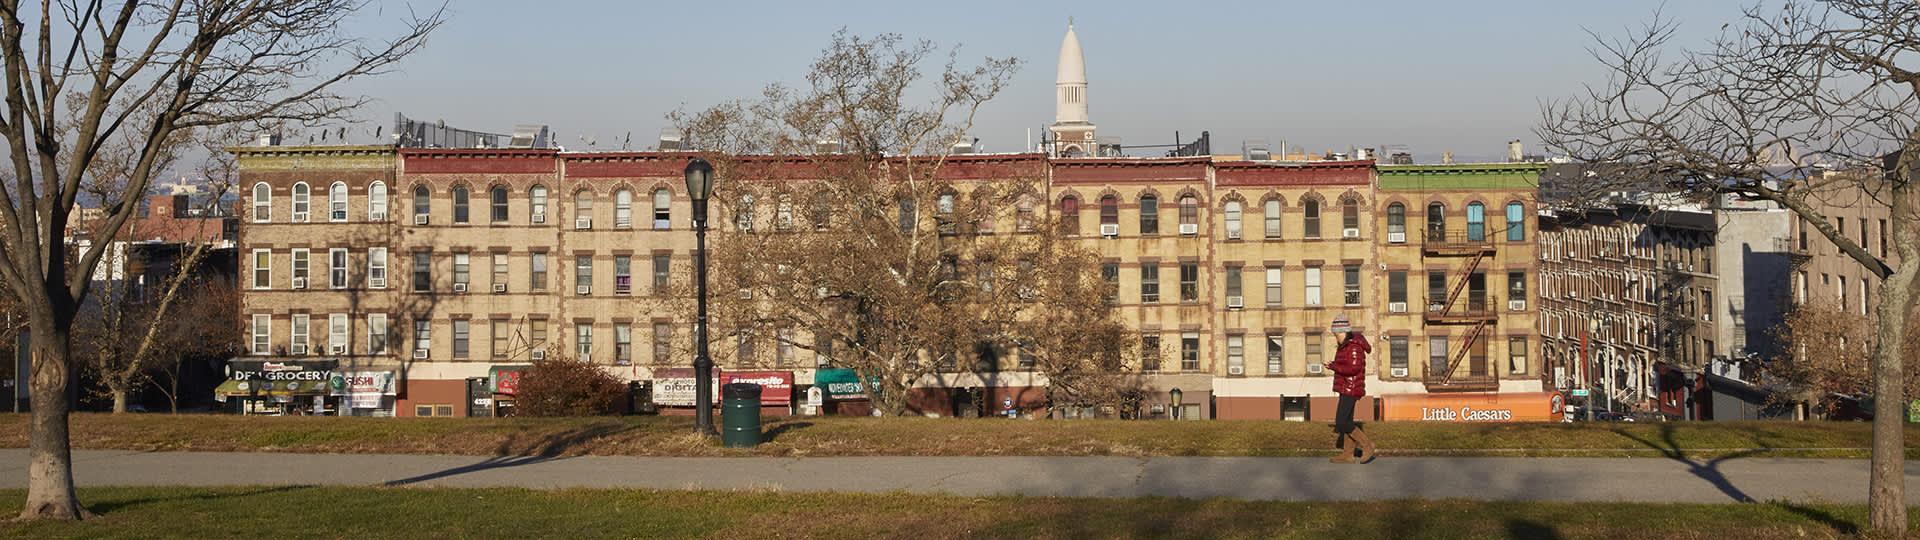 Sunset Park, Brooklyn